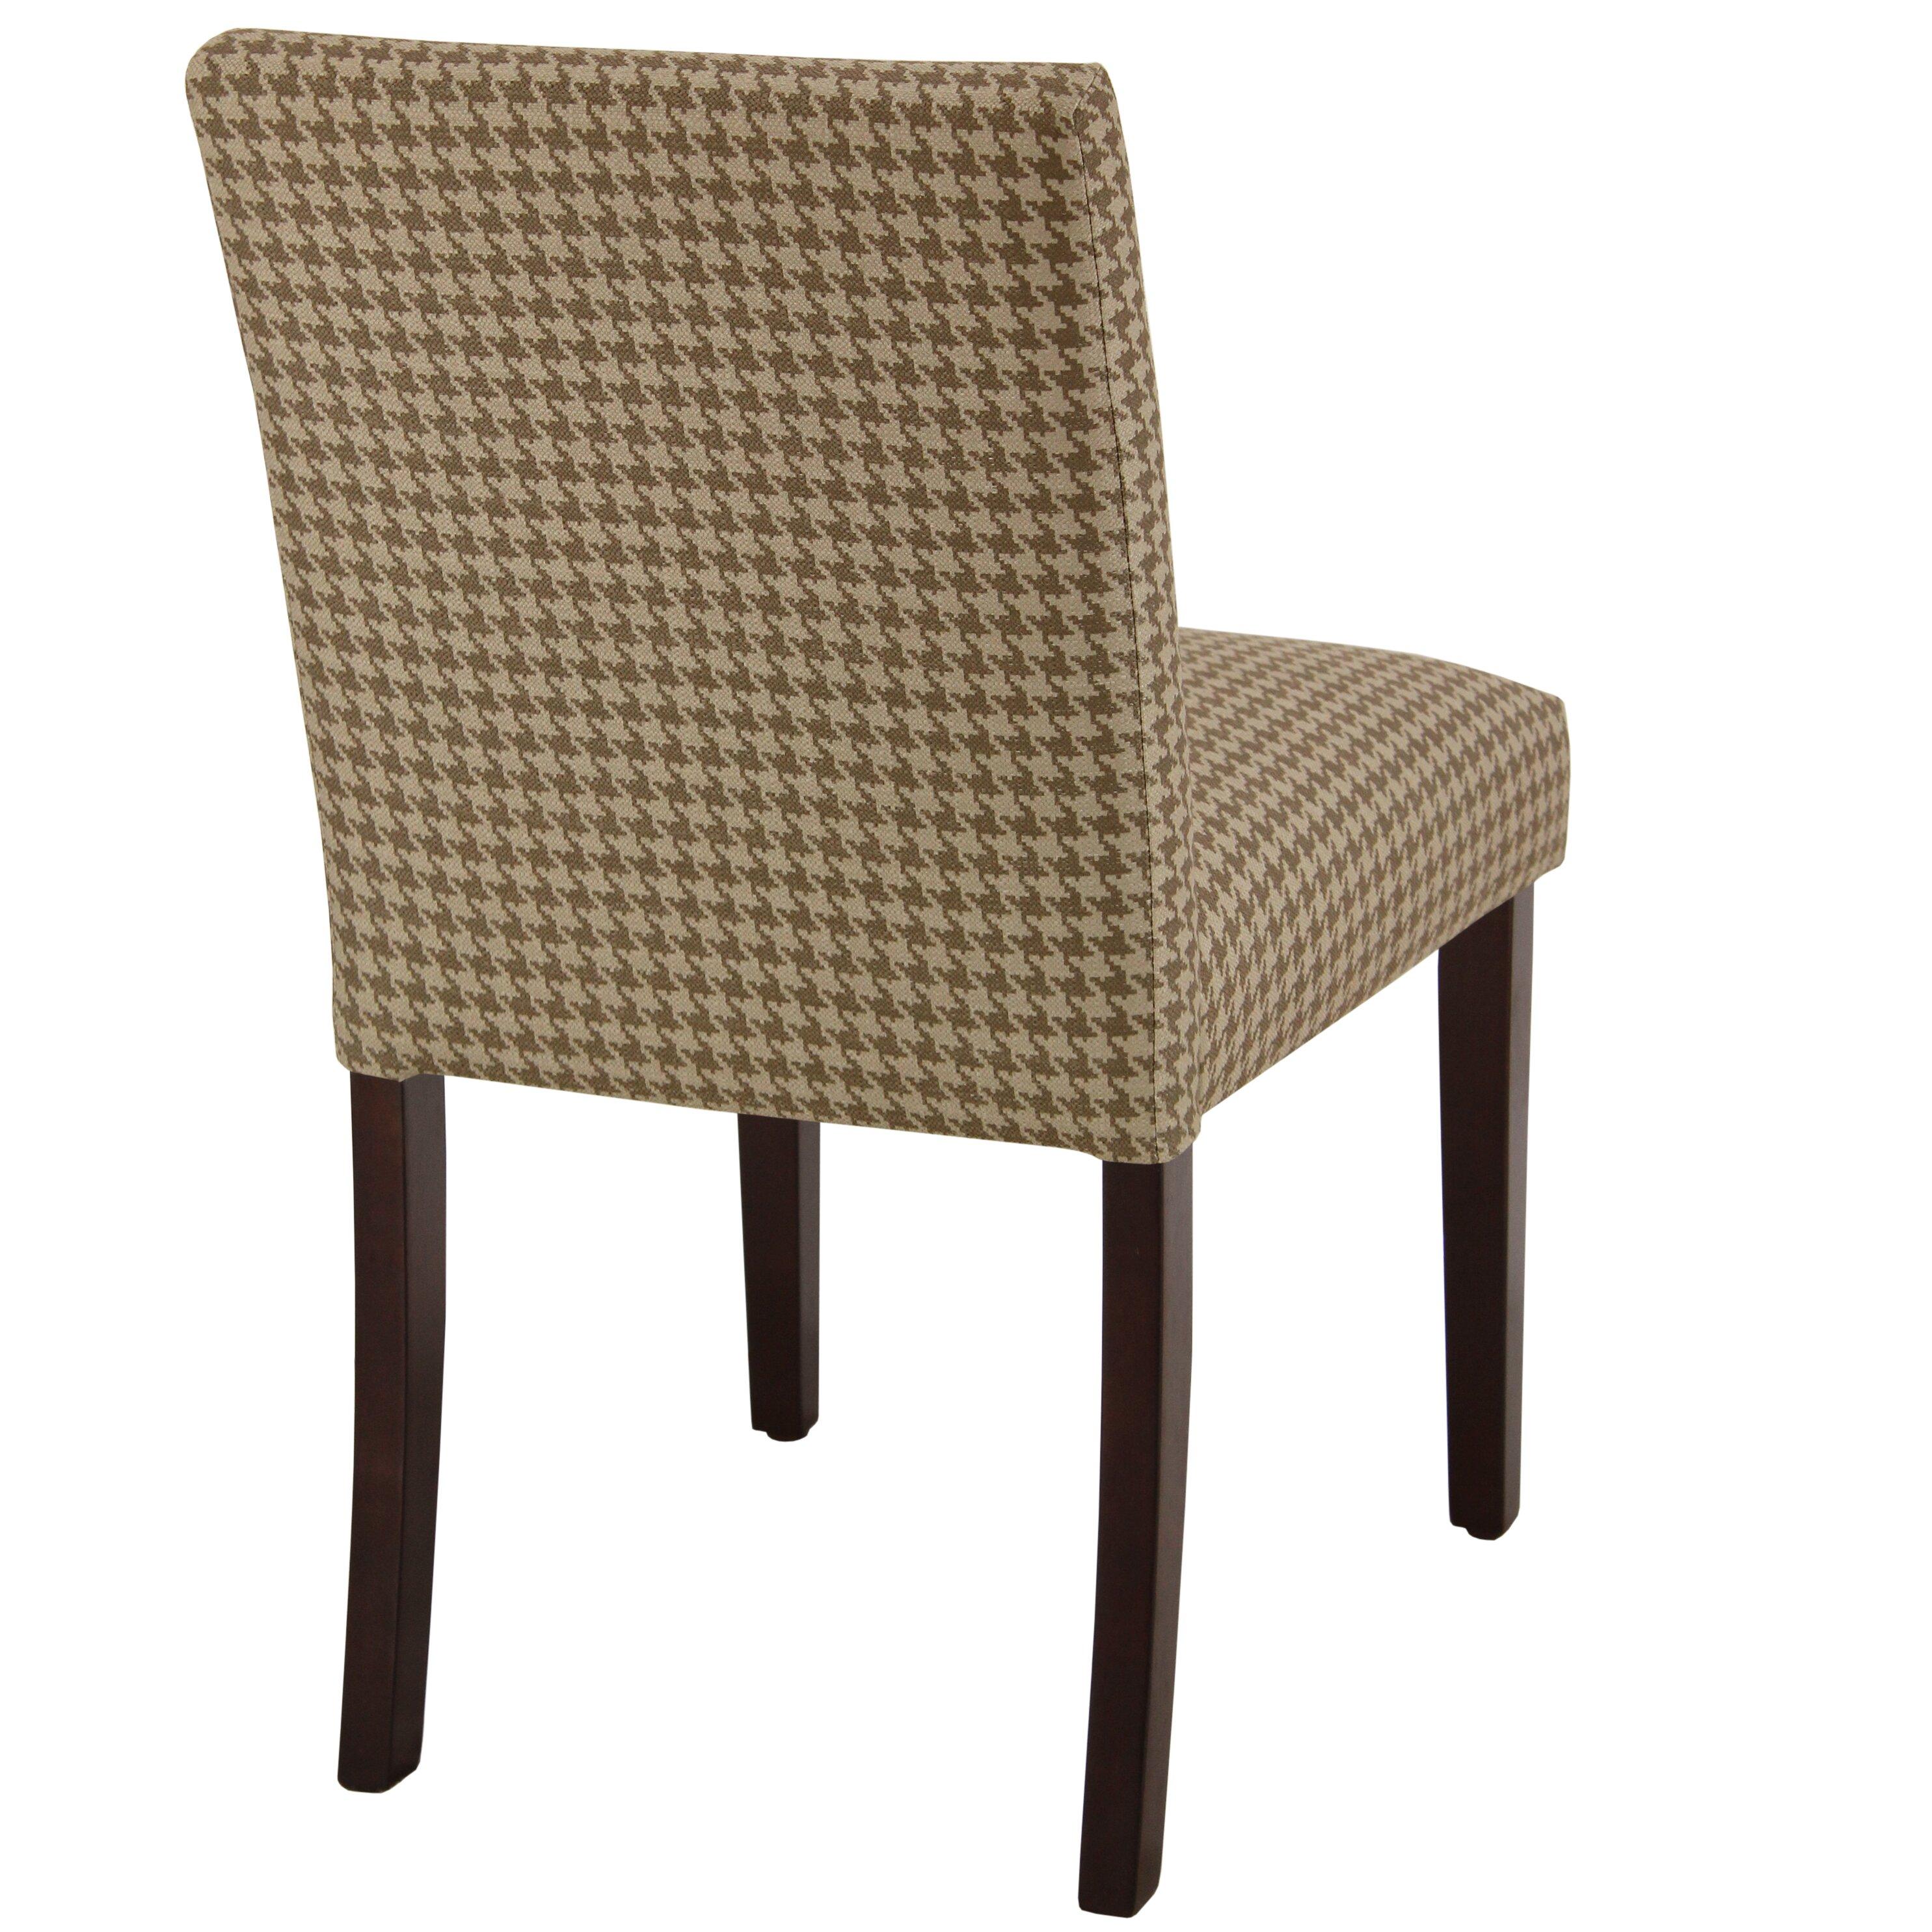 bordelon furniture 28 images barrel studio bordelon 30  : Dining Chair RDBS2707 from www.arteflo.com size 2970 x 2970 jpeg 1193kB